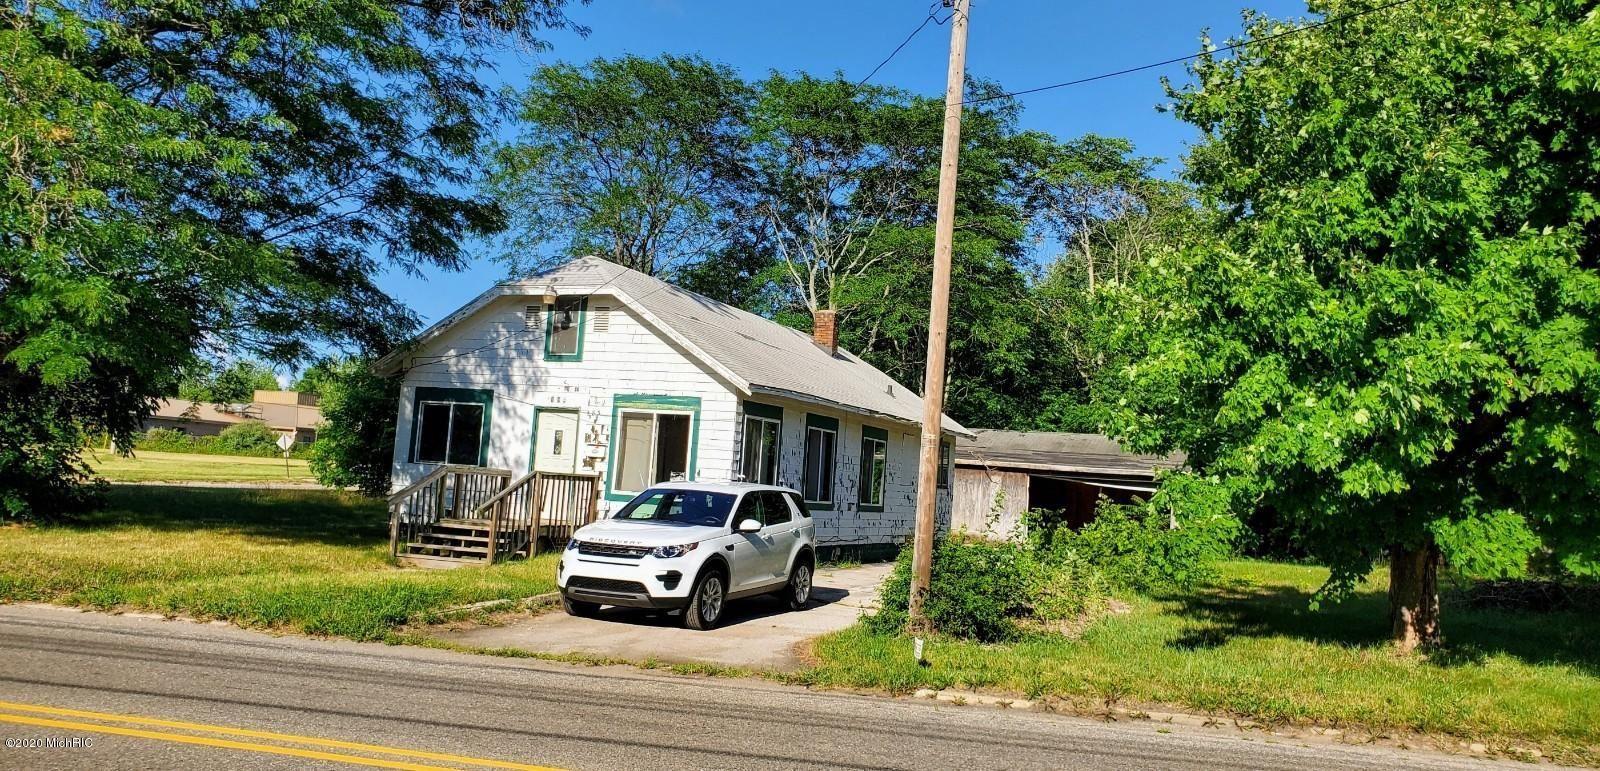 483 Paw Paw Avenue, Benton Harbor, MI 49022 - MLS#: 20031814